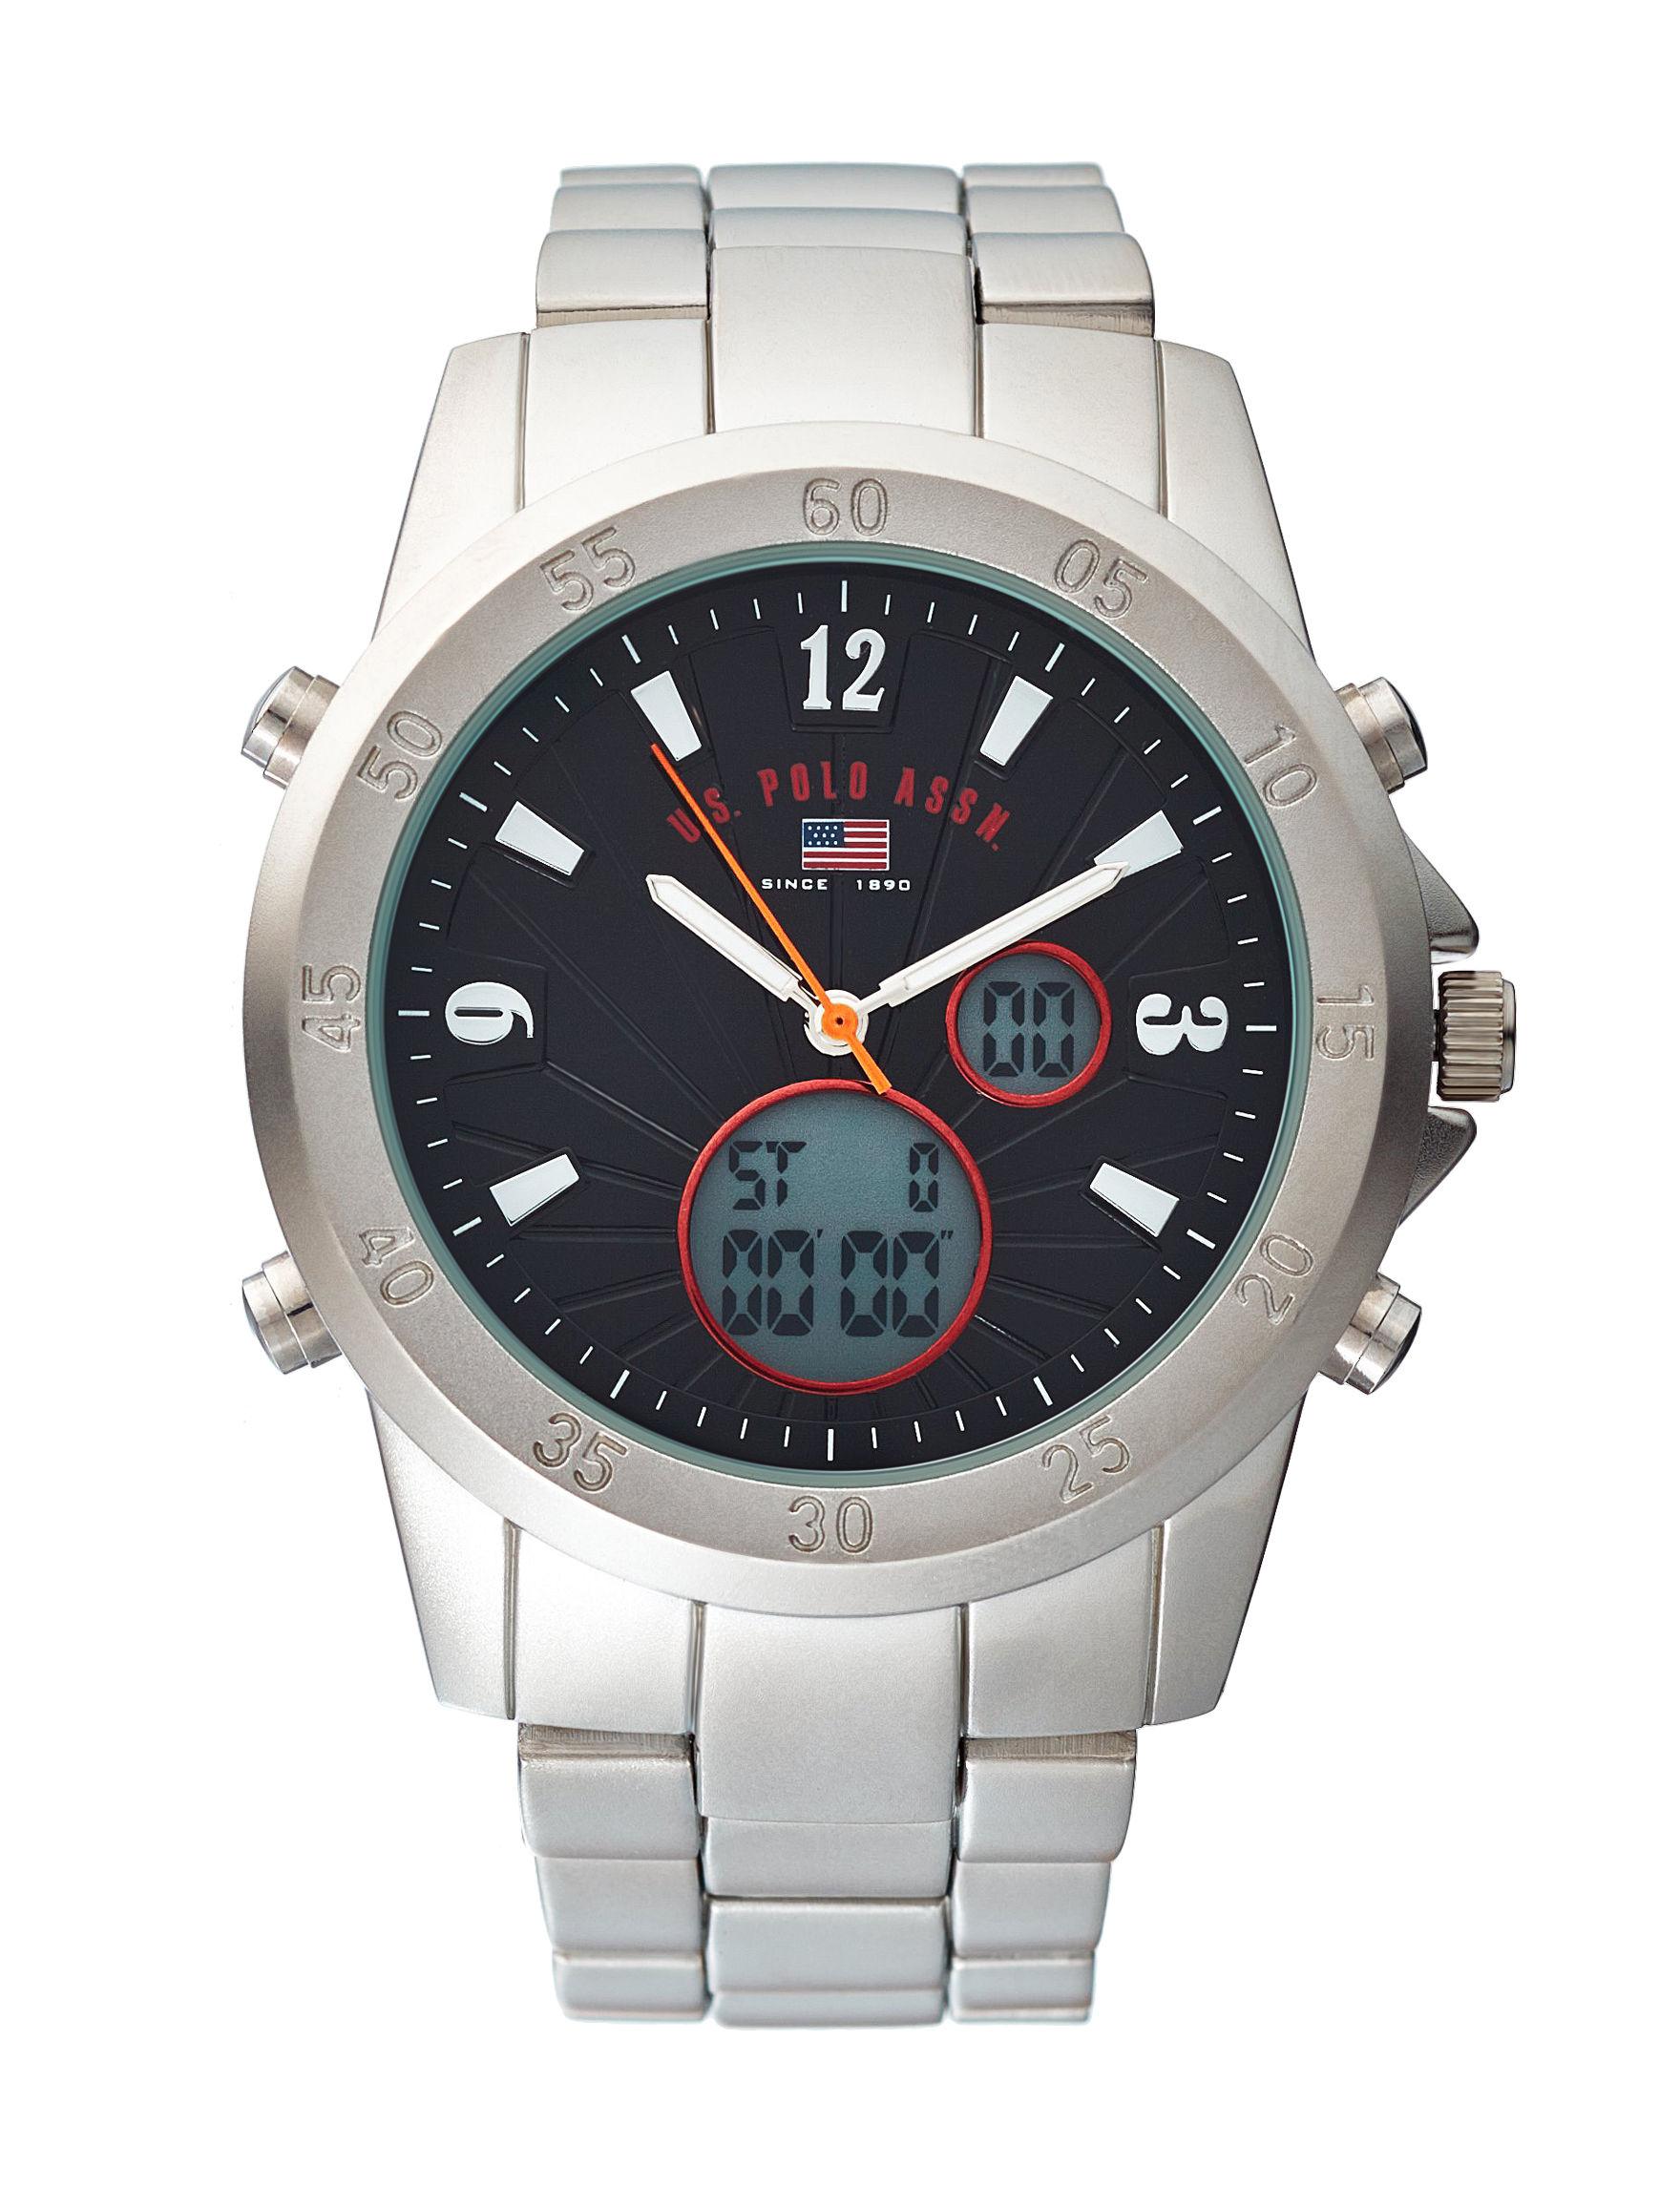 U.S. Polo Assn. Silver Fashion Watches